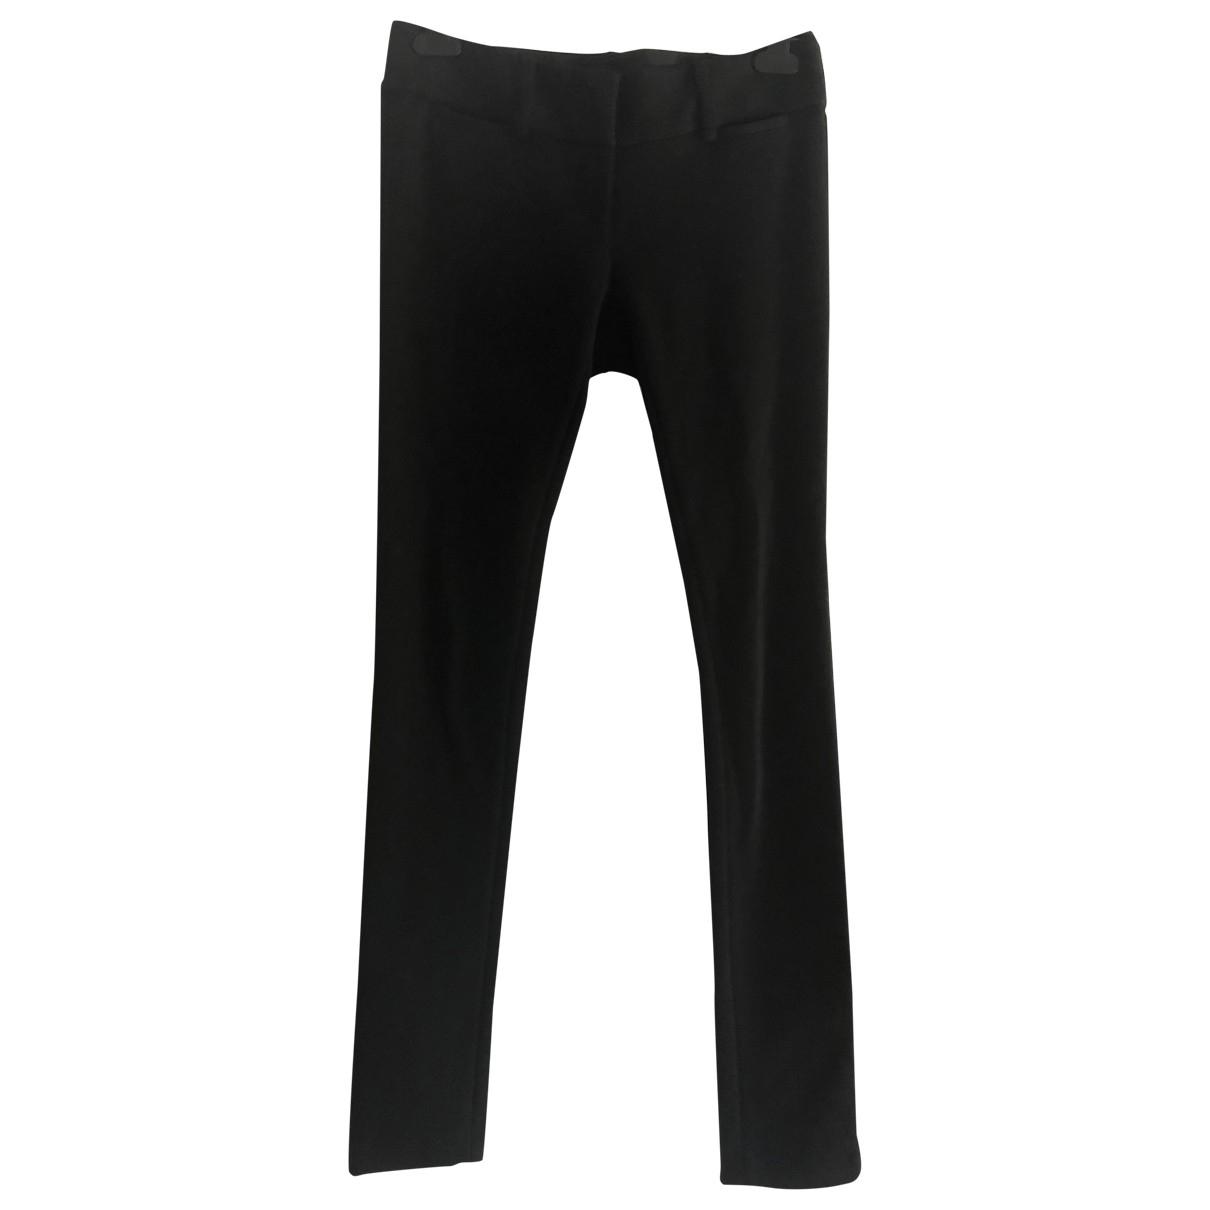 Diane Von Furstenberg \N Black Wool Trousers for Women 4 US